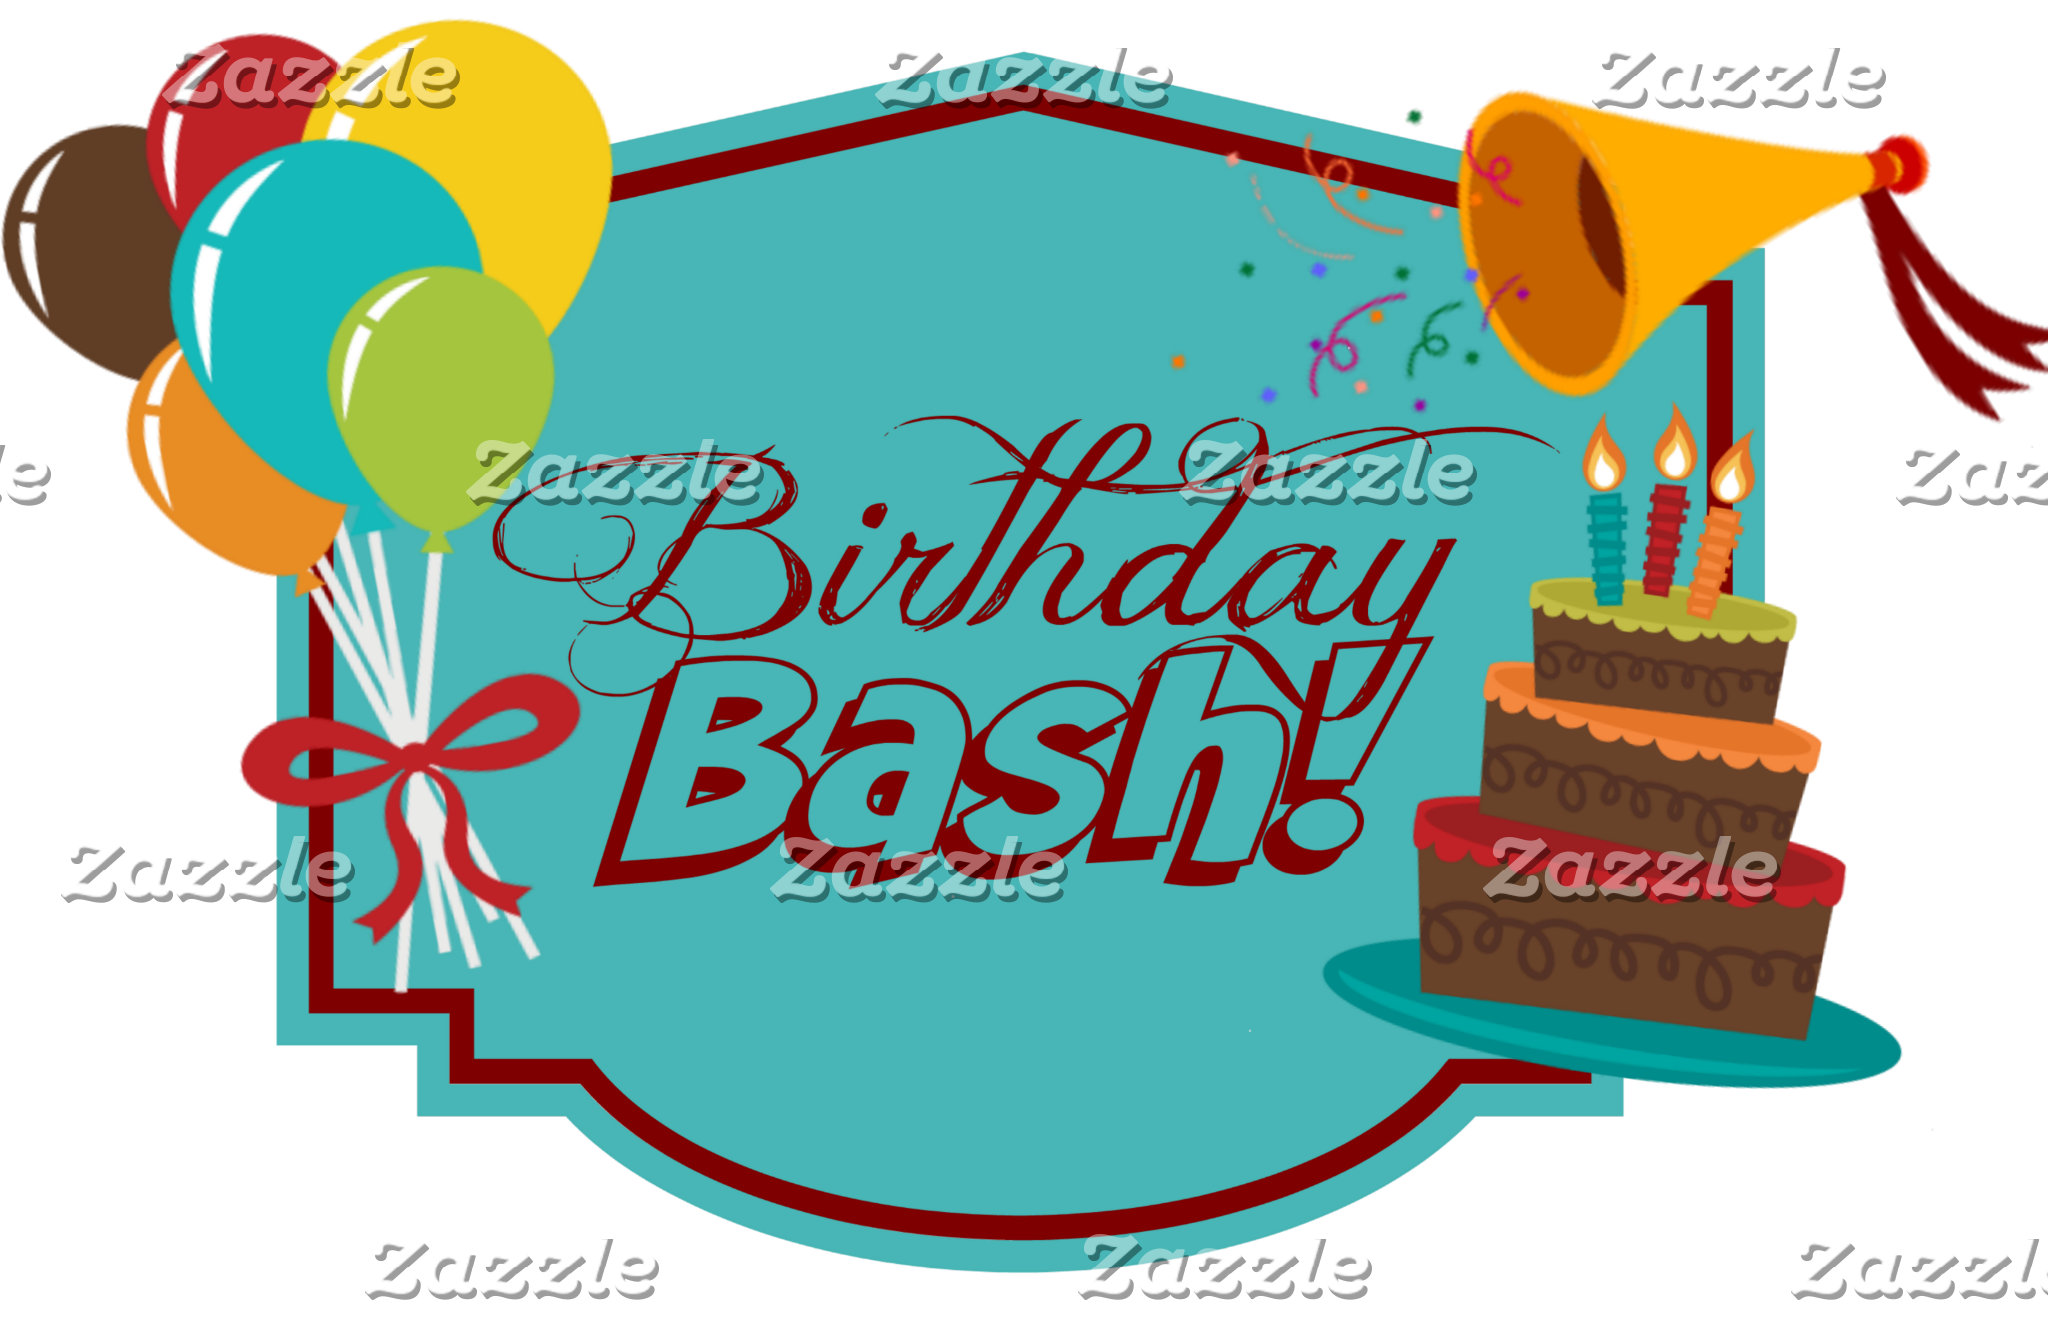 Boagie's Birthday Bash